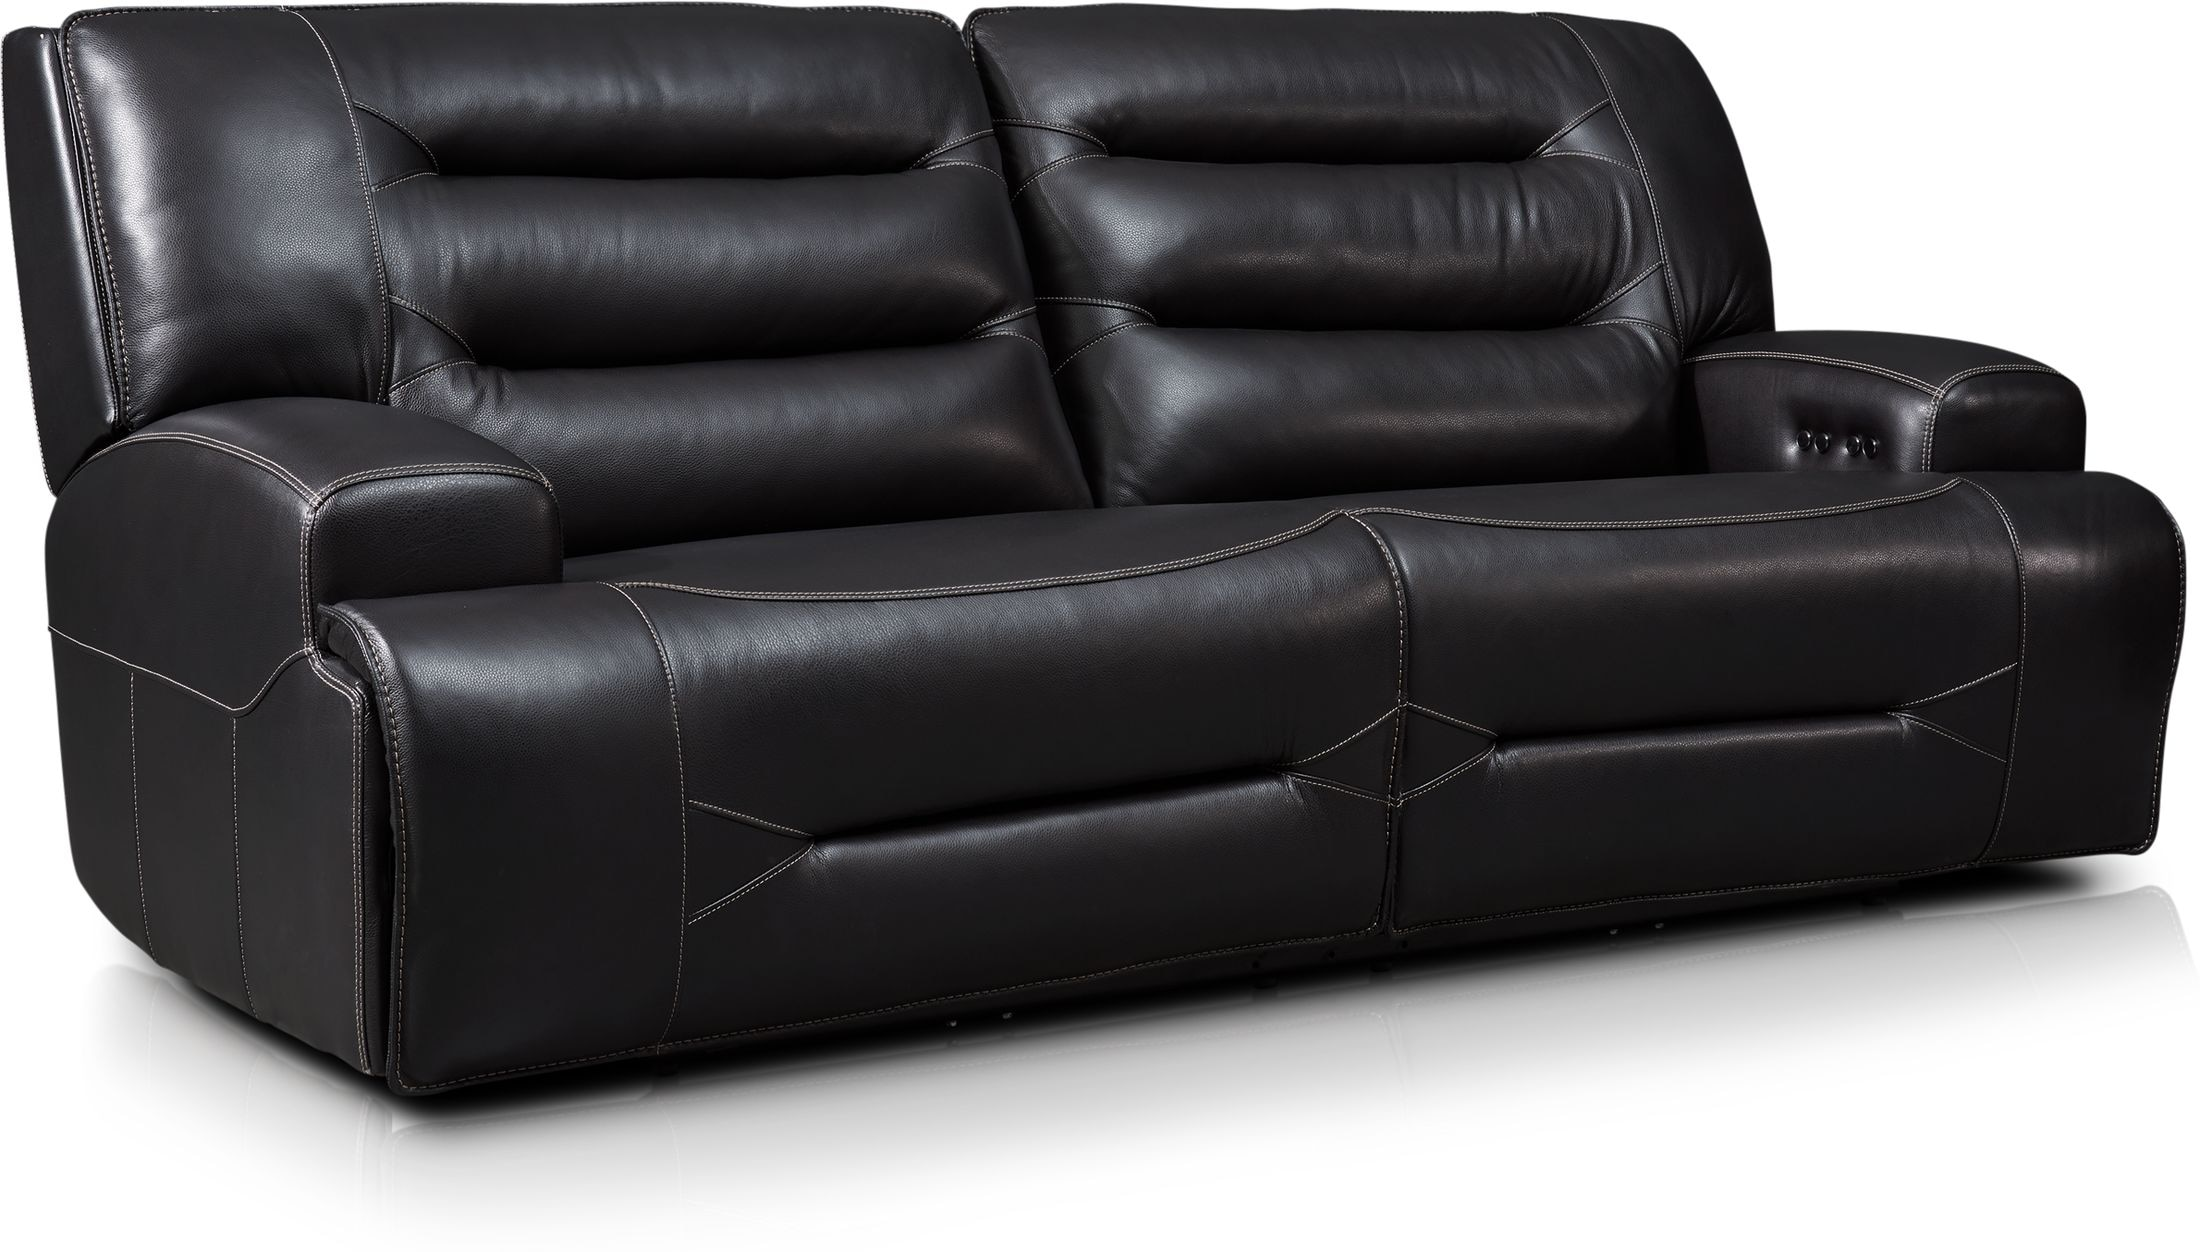 Living Room Furniture - Preston Dual-Power Reclining Sofa - Black